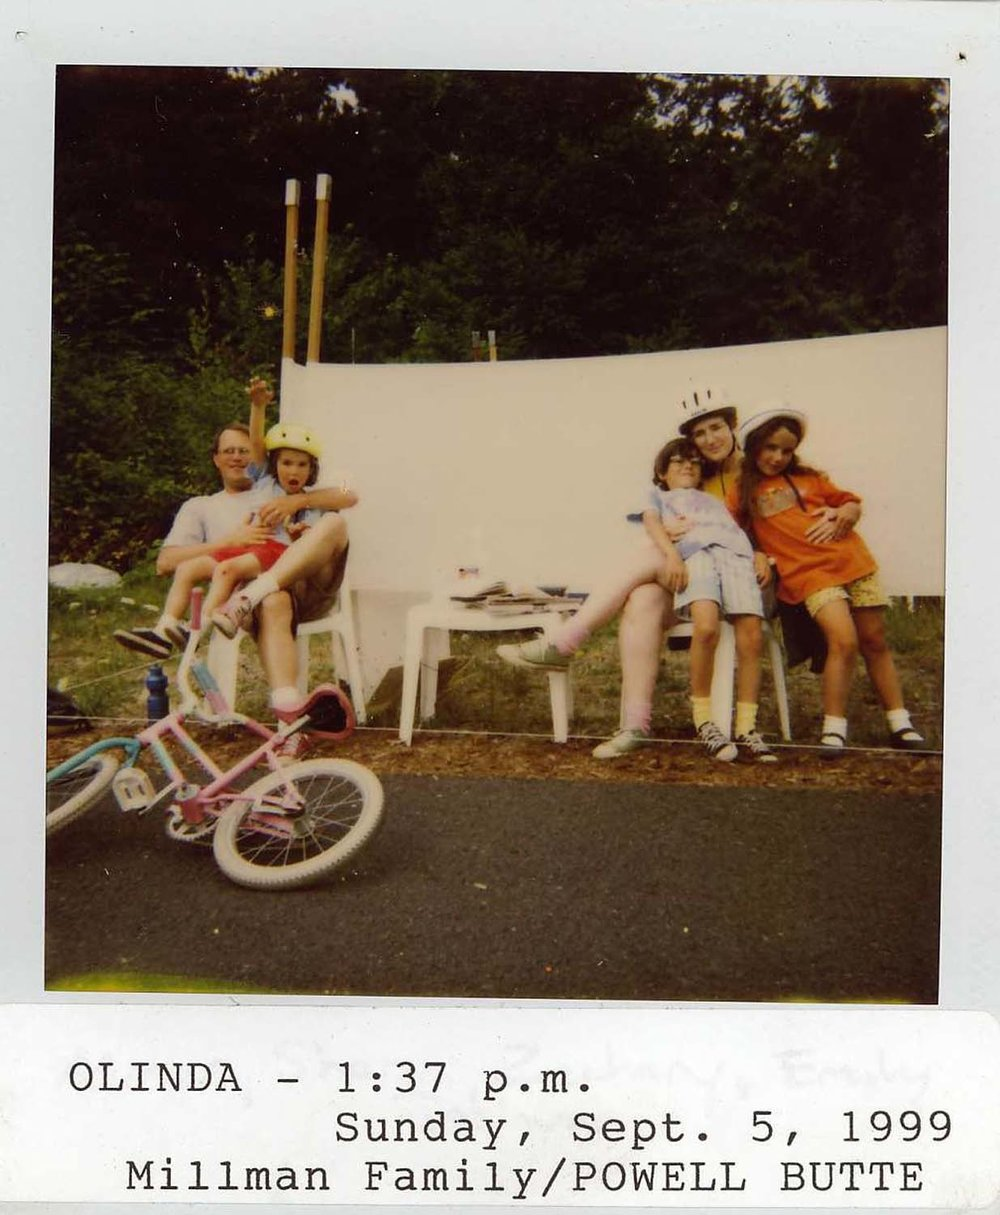 olinda137.jpg